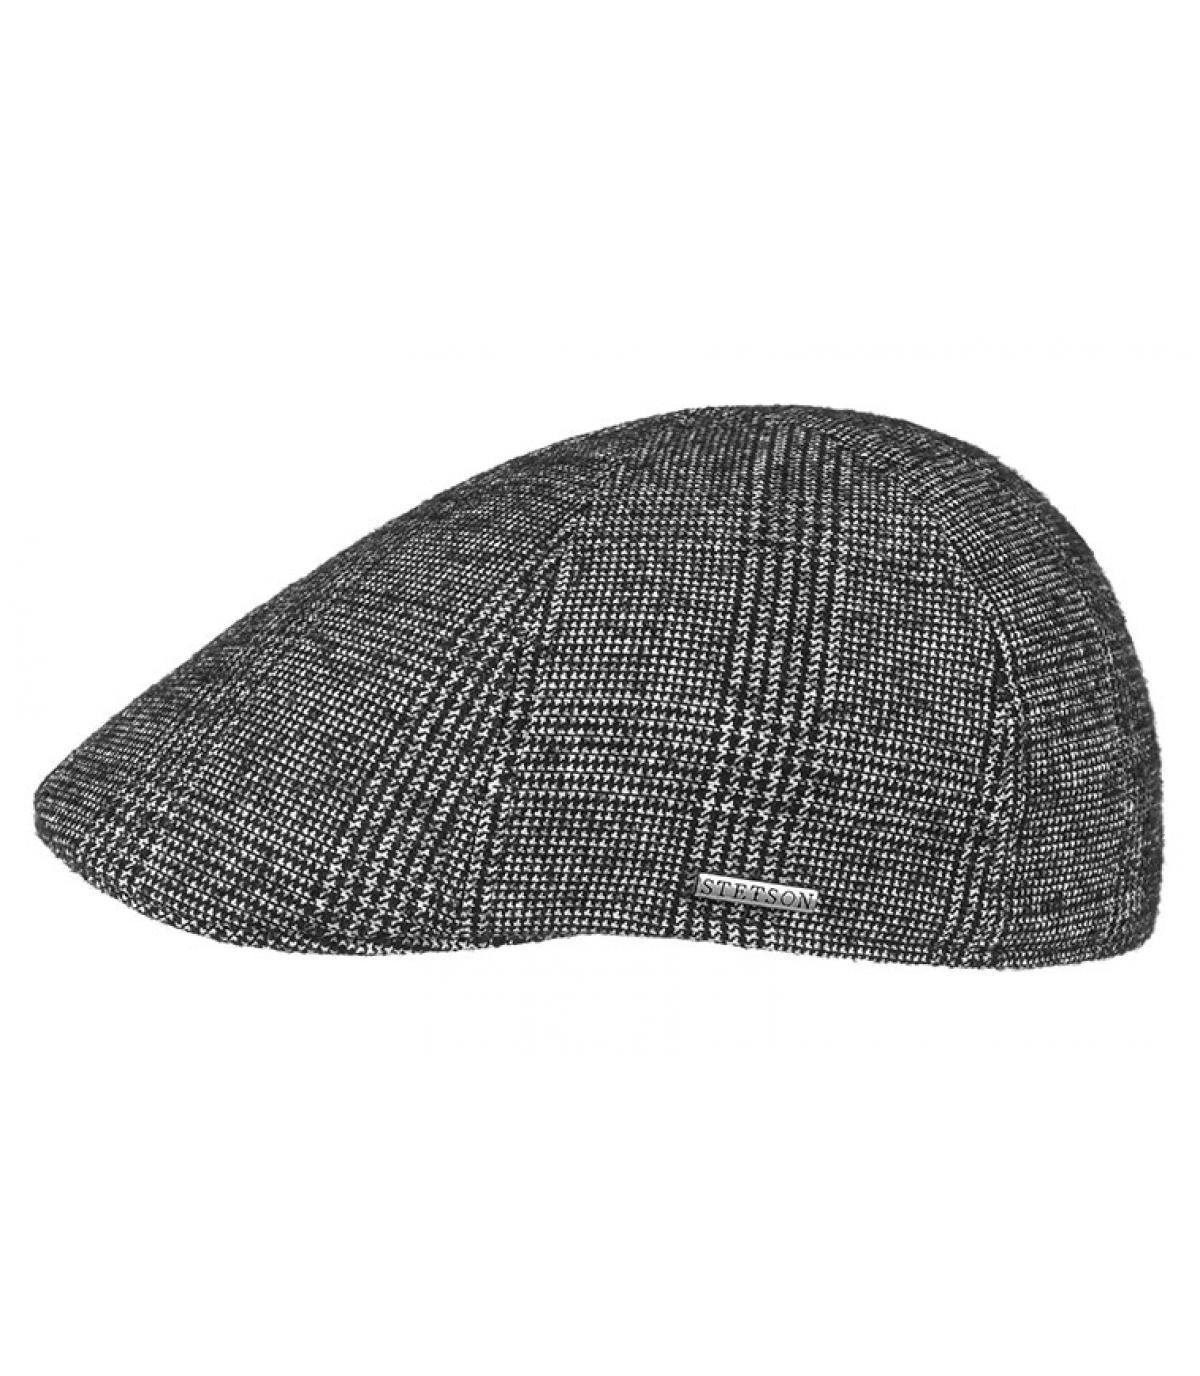 Détails Texas Wool black white check - image 2